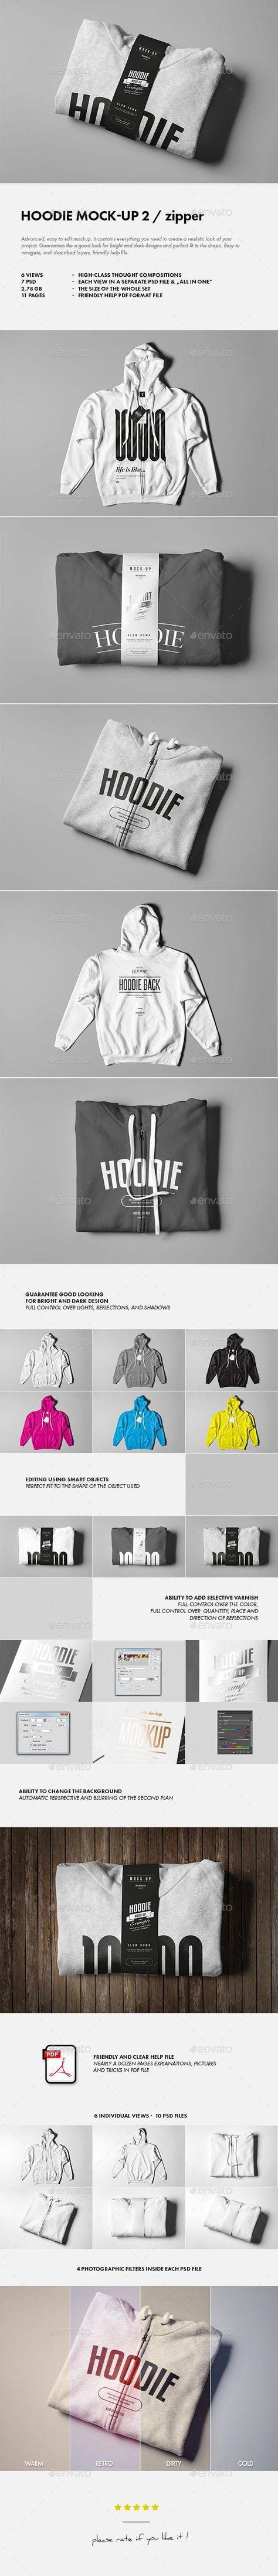 Download Hoodie Mock Up 2 For 9 Mockupdesign Productmockup Clothing Designresource Envato Design Template Mockup A Hoodie Mockup Clothing Mockup Mockup Design